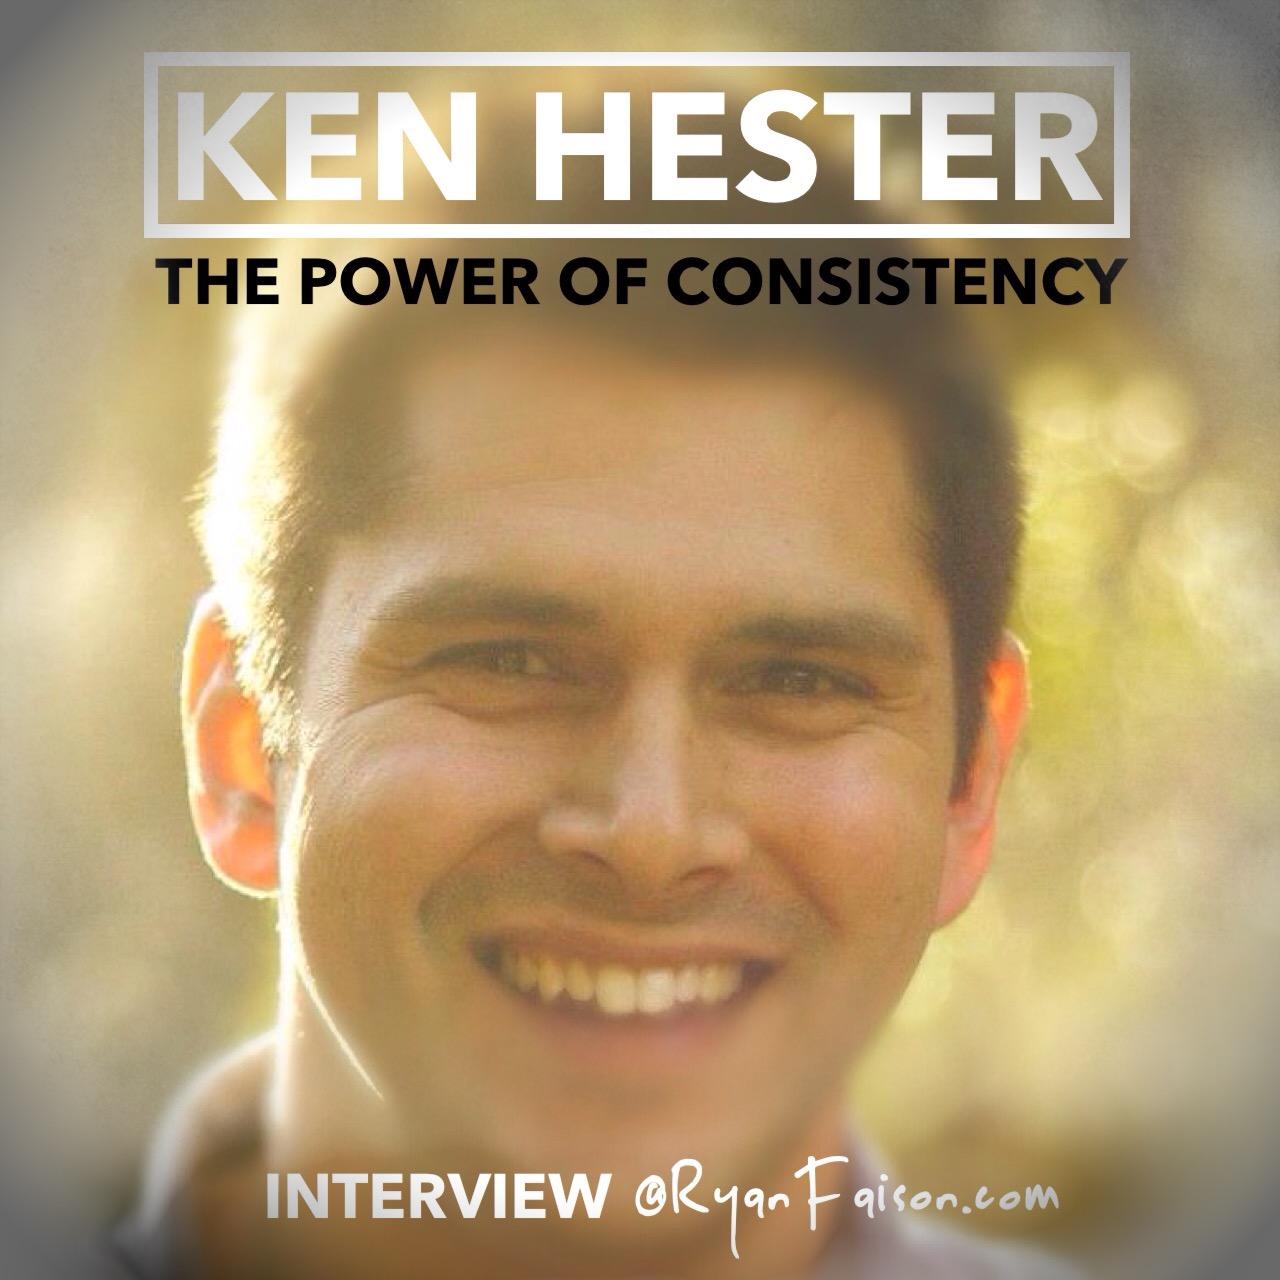 KenHesterInterview